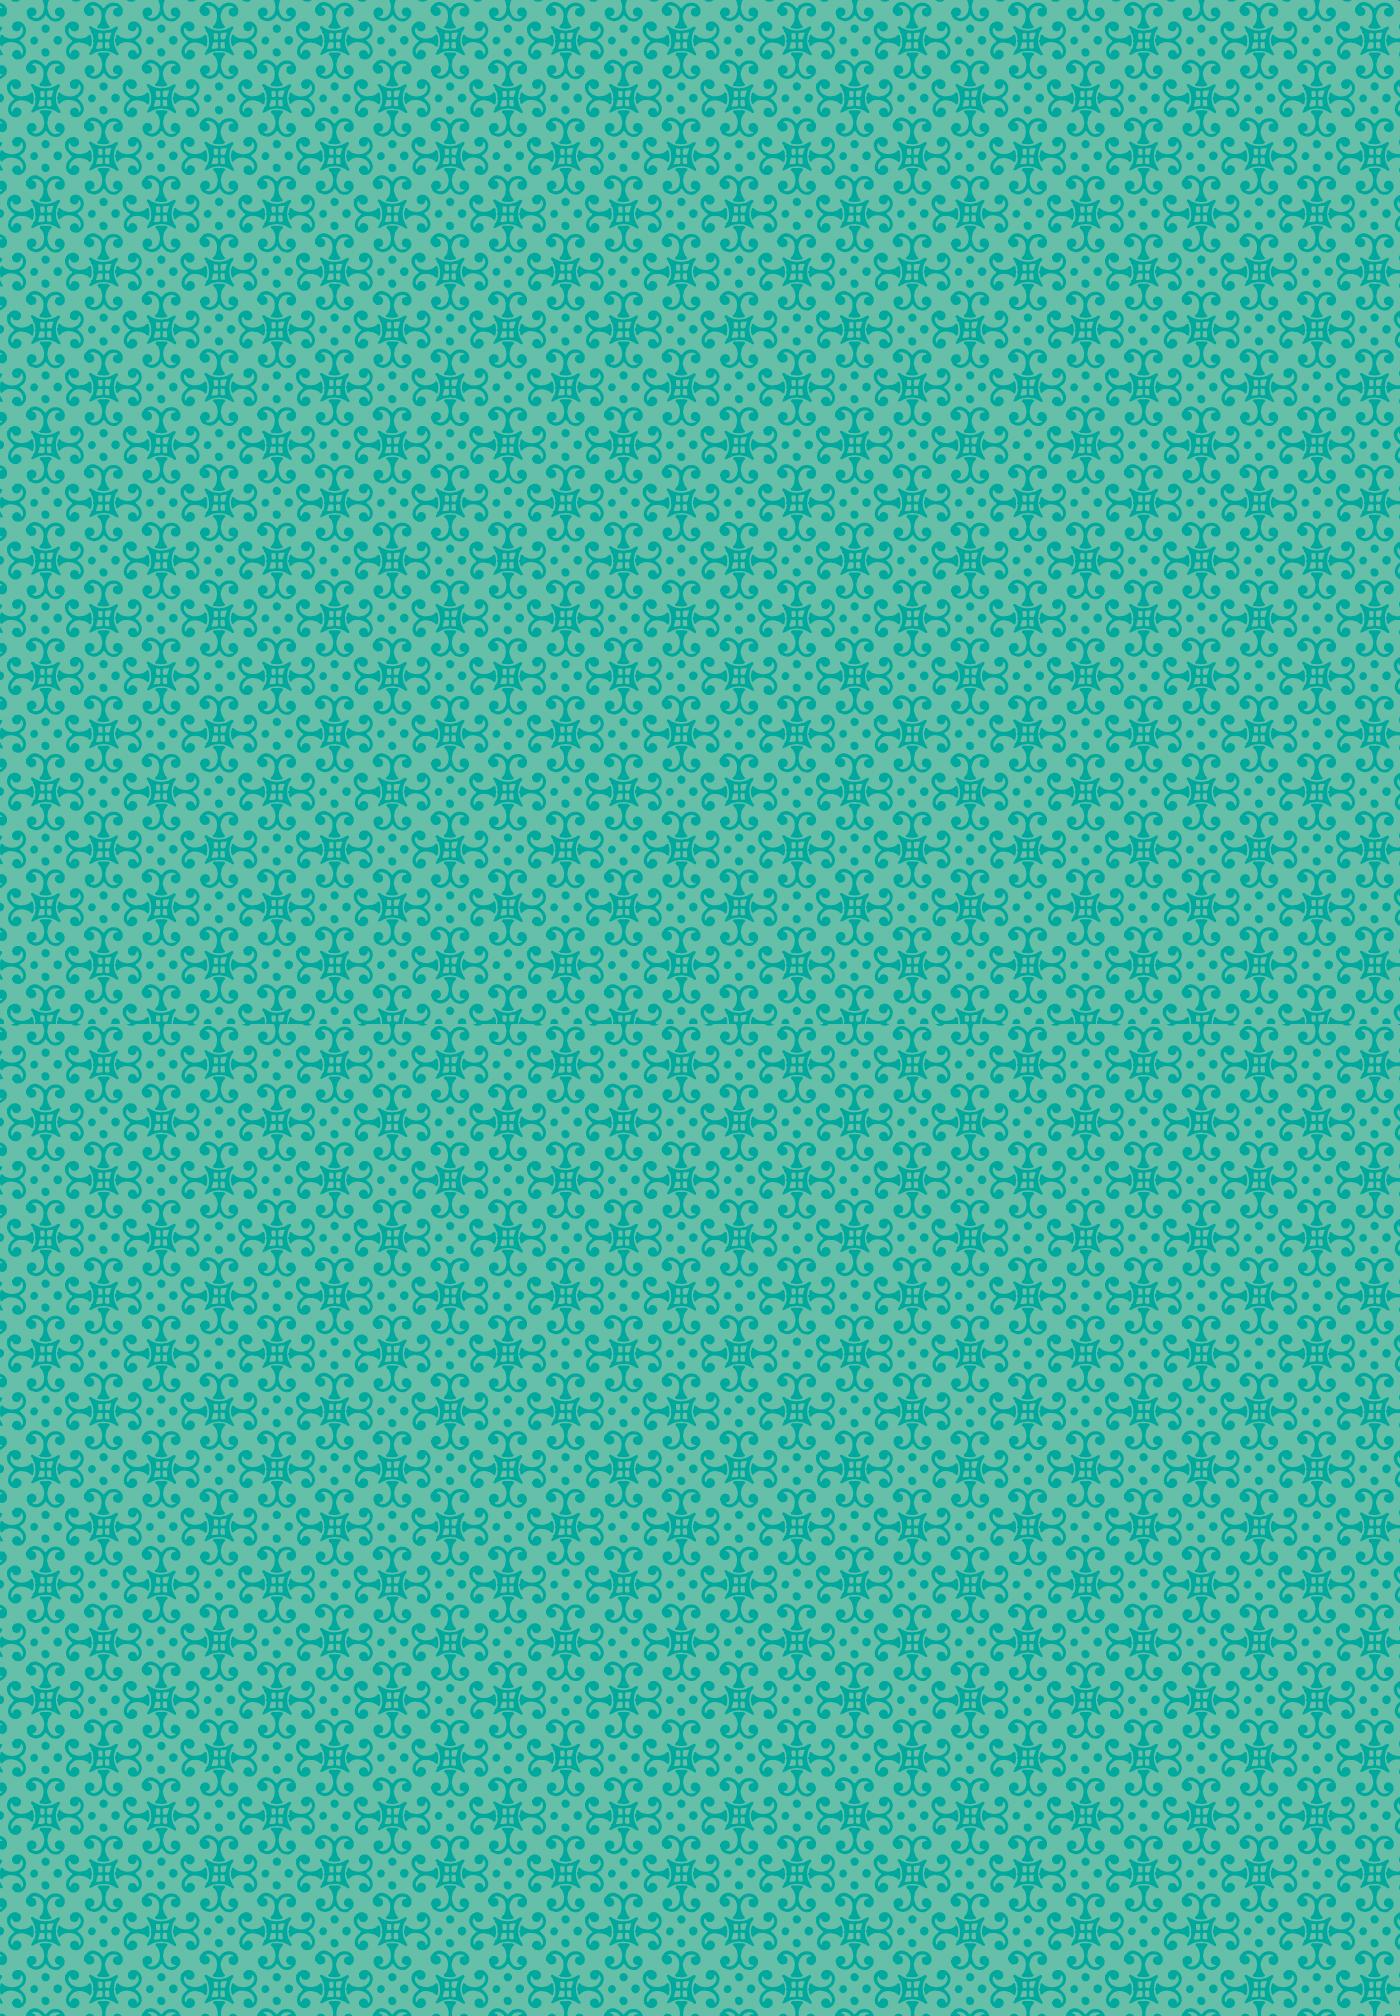 turquoise background 2 by aliwithaneye on deviantart